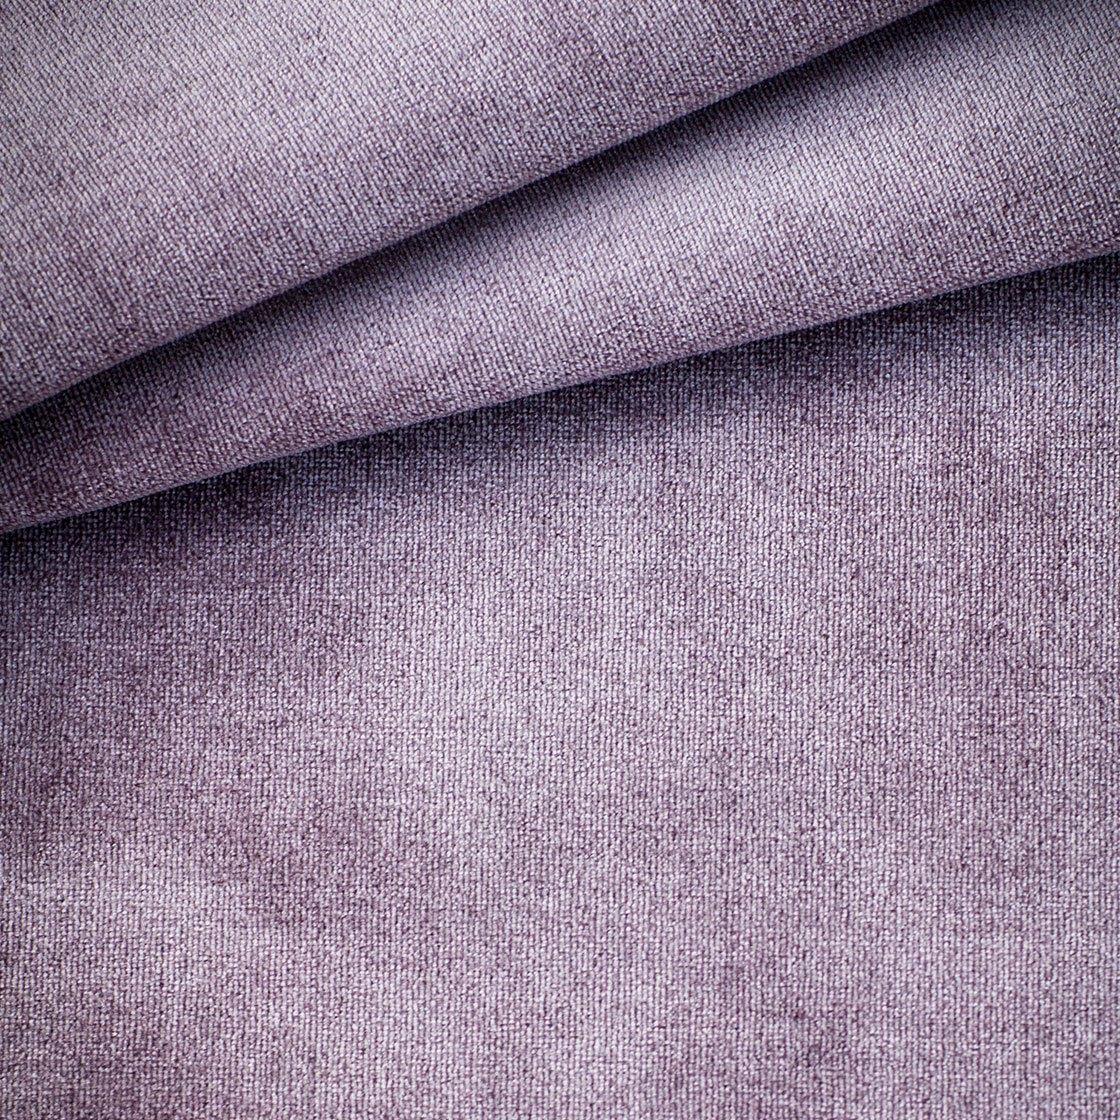 Capri Silk Velvet - Lilac - Beaumont & Fletcher - Beaumont & Fletcher